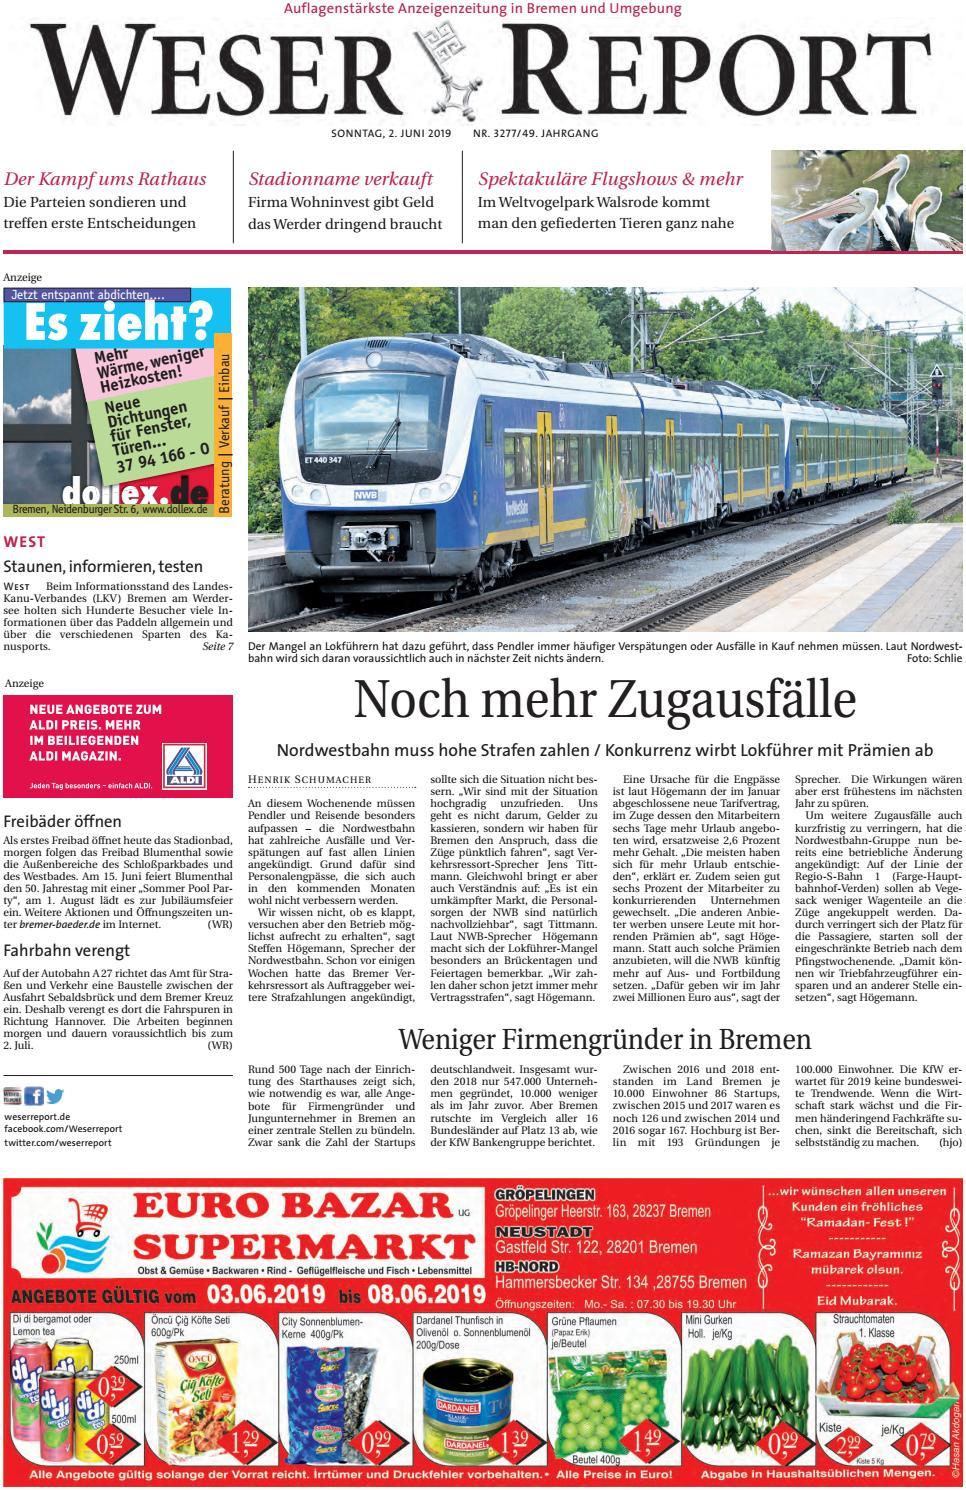 Weser Report - West vom 02.06.2019 by KPS Verlagsgesellschaft mbH ...